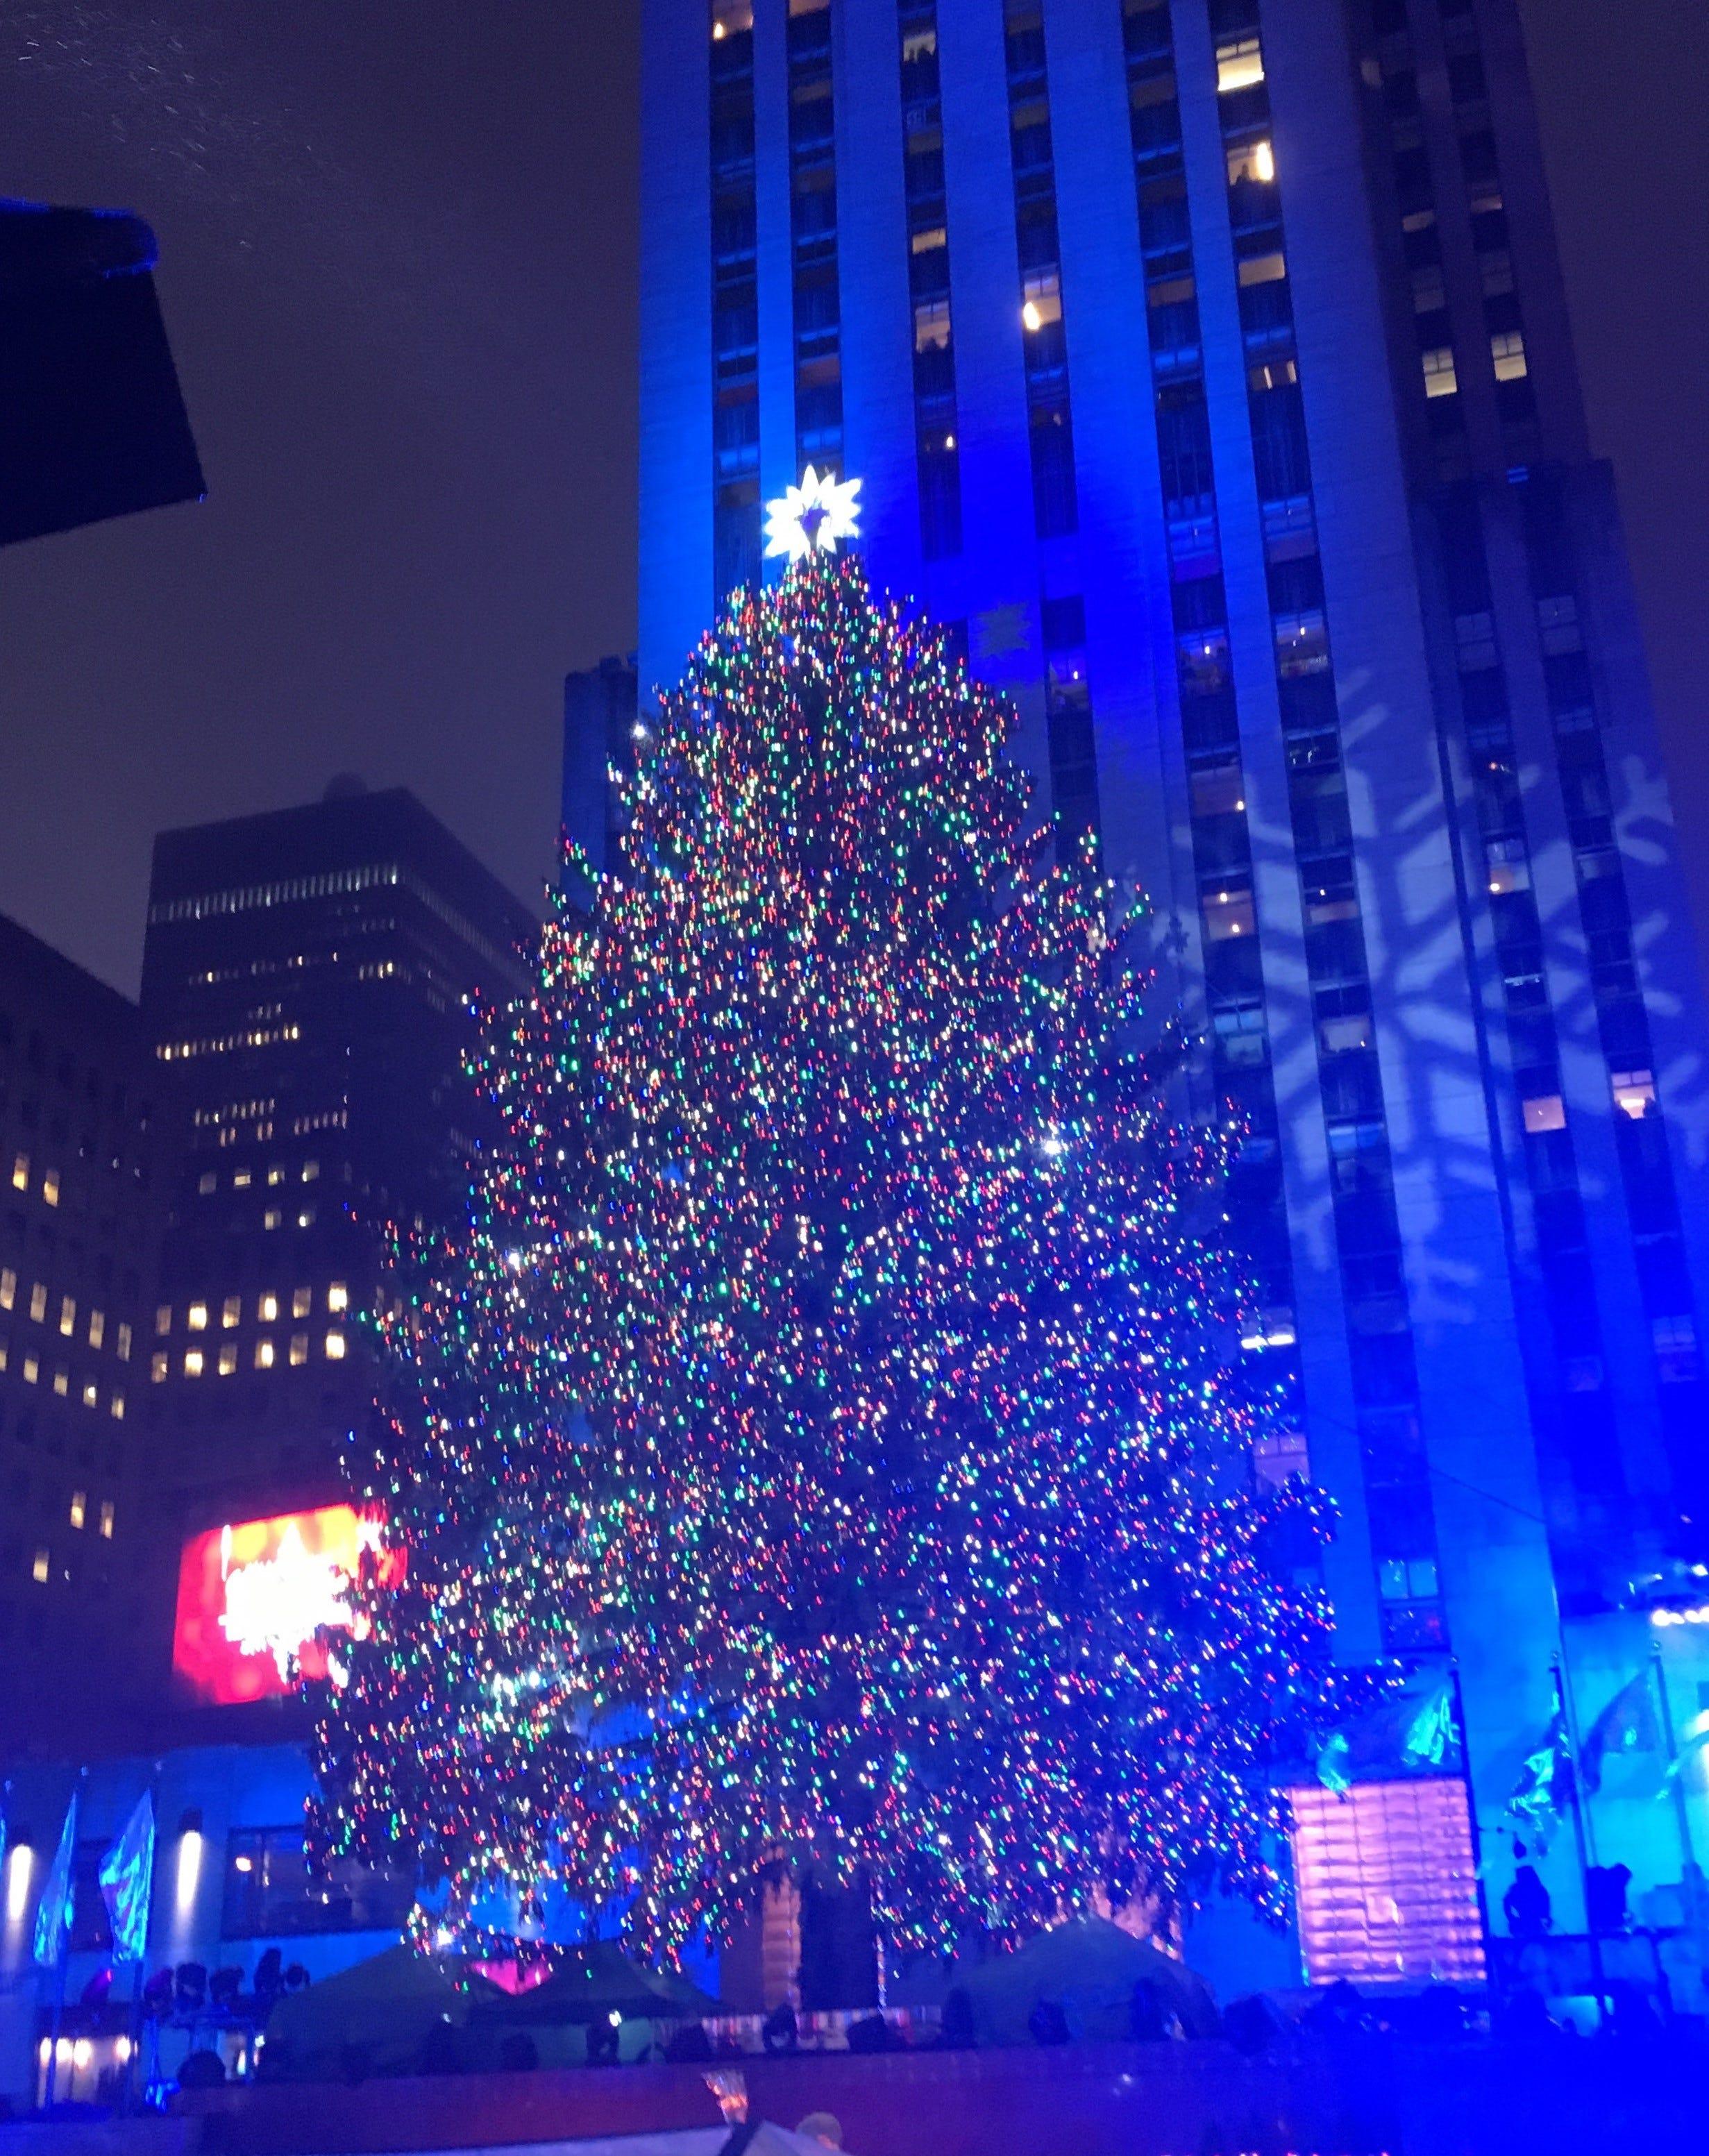 & The Rockefeller Center Christmas Tree lights up azcodes.com